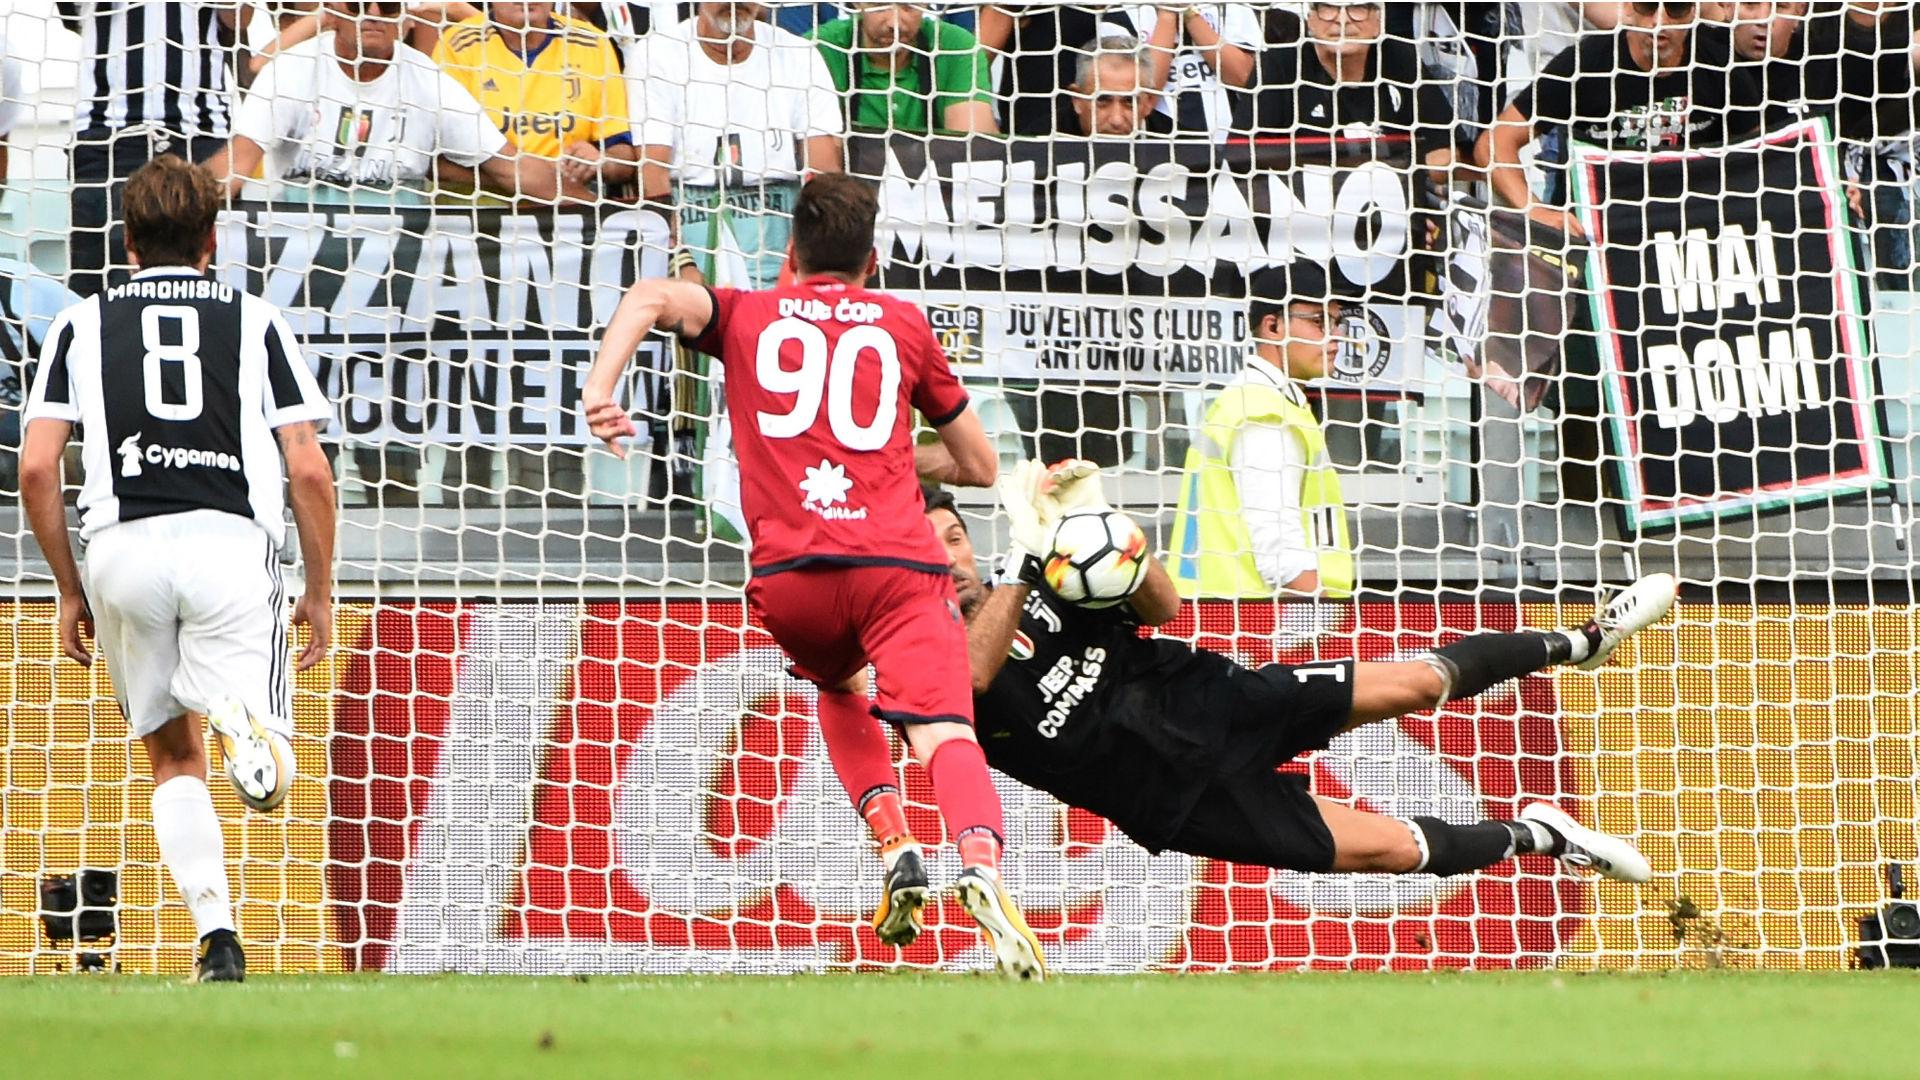 Juventus vs Cagliari 3-0 | How the bianconeri did